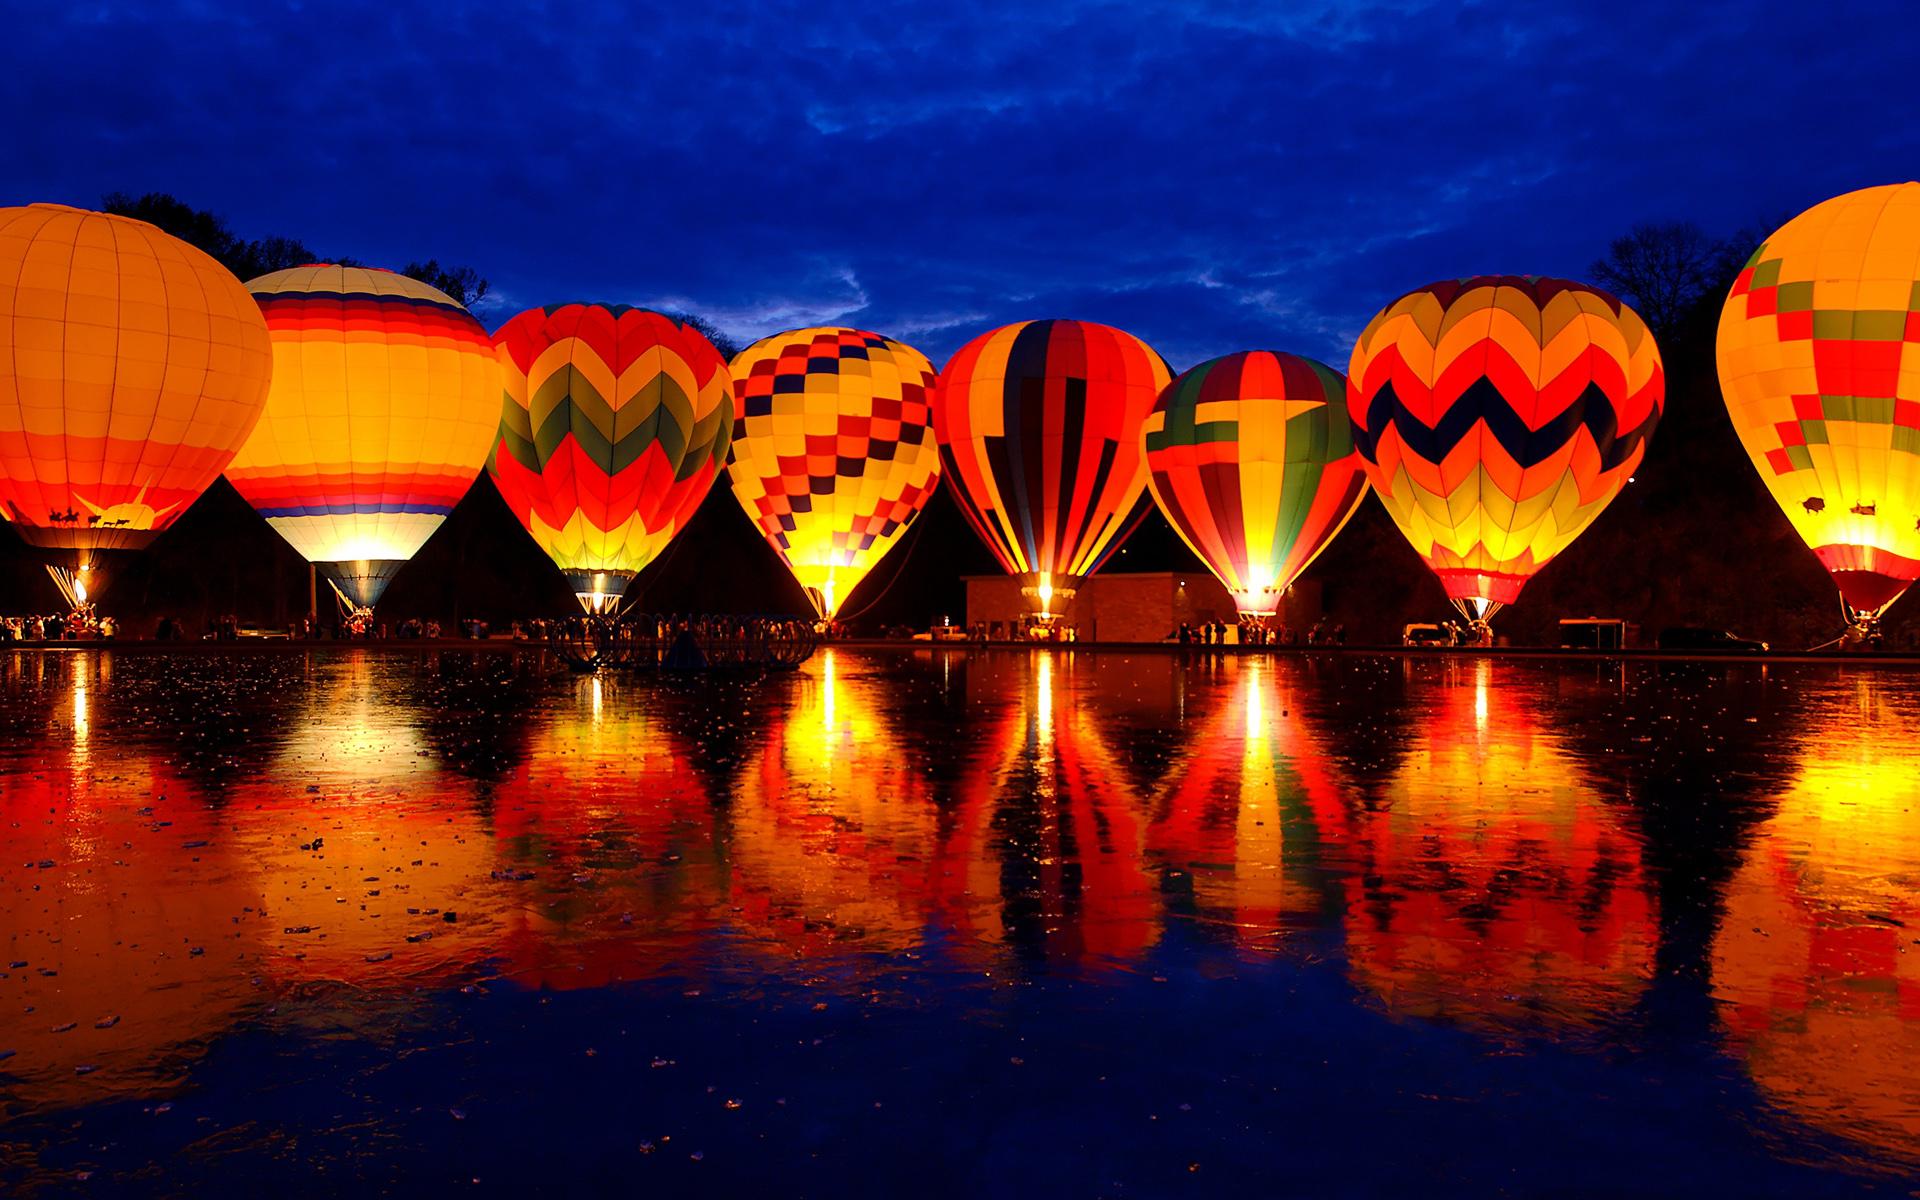 Balluminaria Hot Air Balloon Glow Festival Wallpapers HD Wallpapers 1920x1200